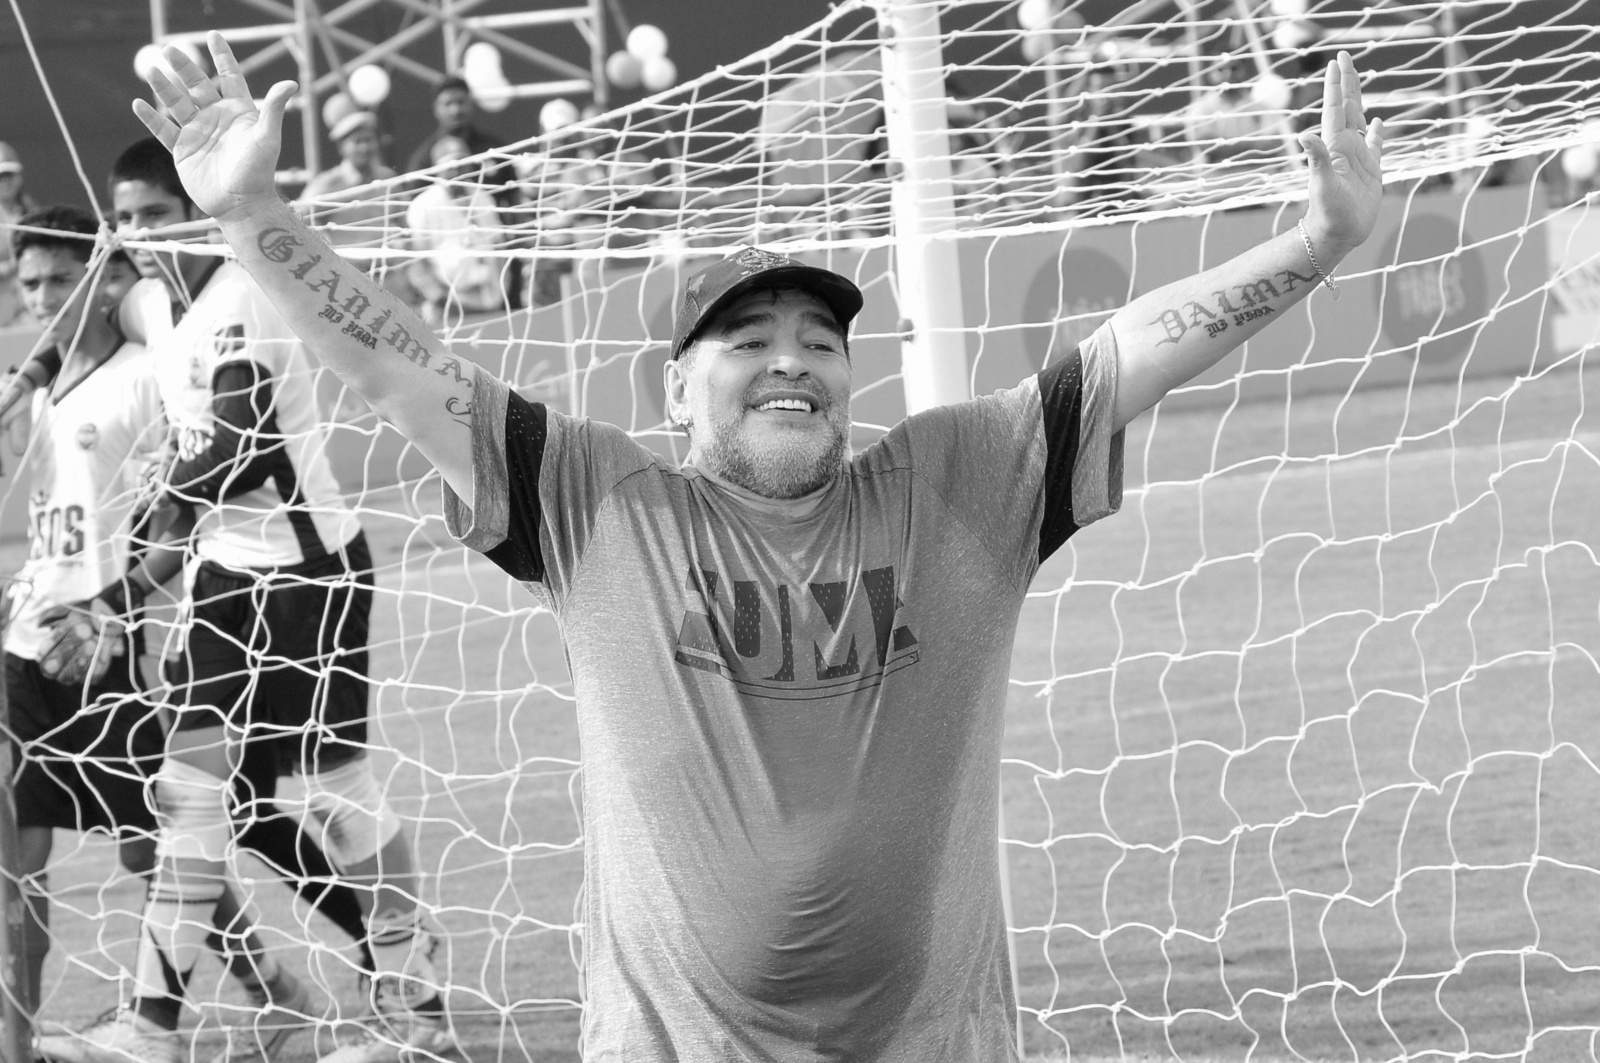 Сотрудника похоронного бюро уволили за фото с телом Марадоны